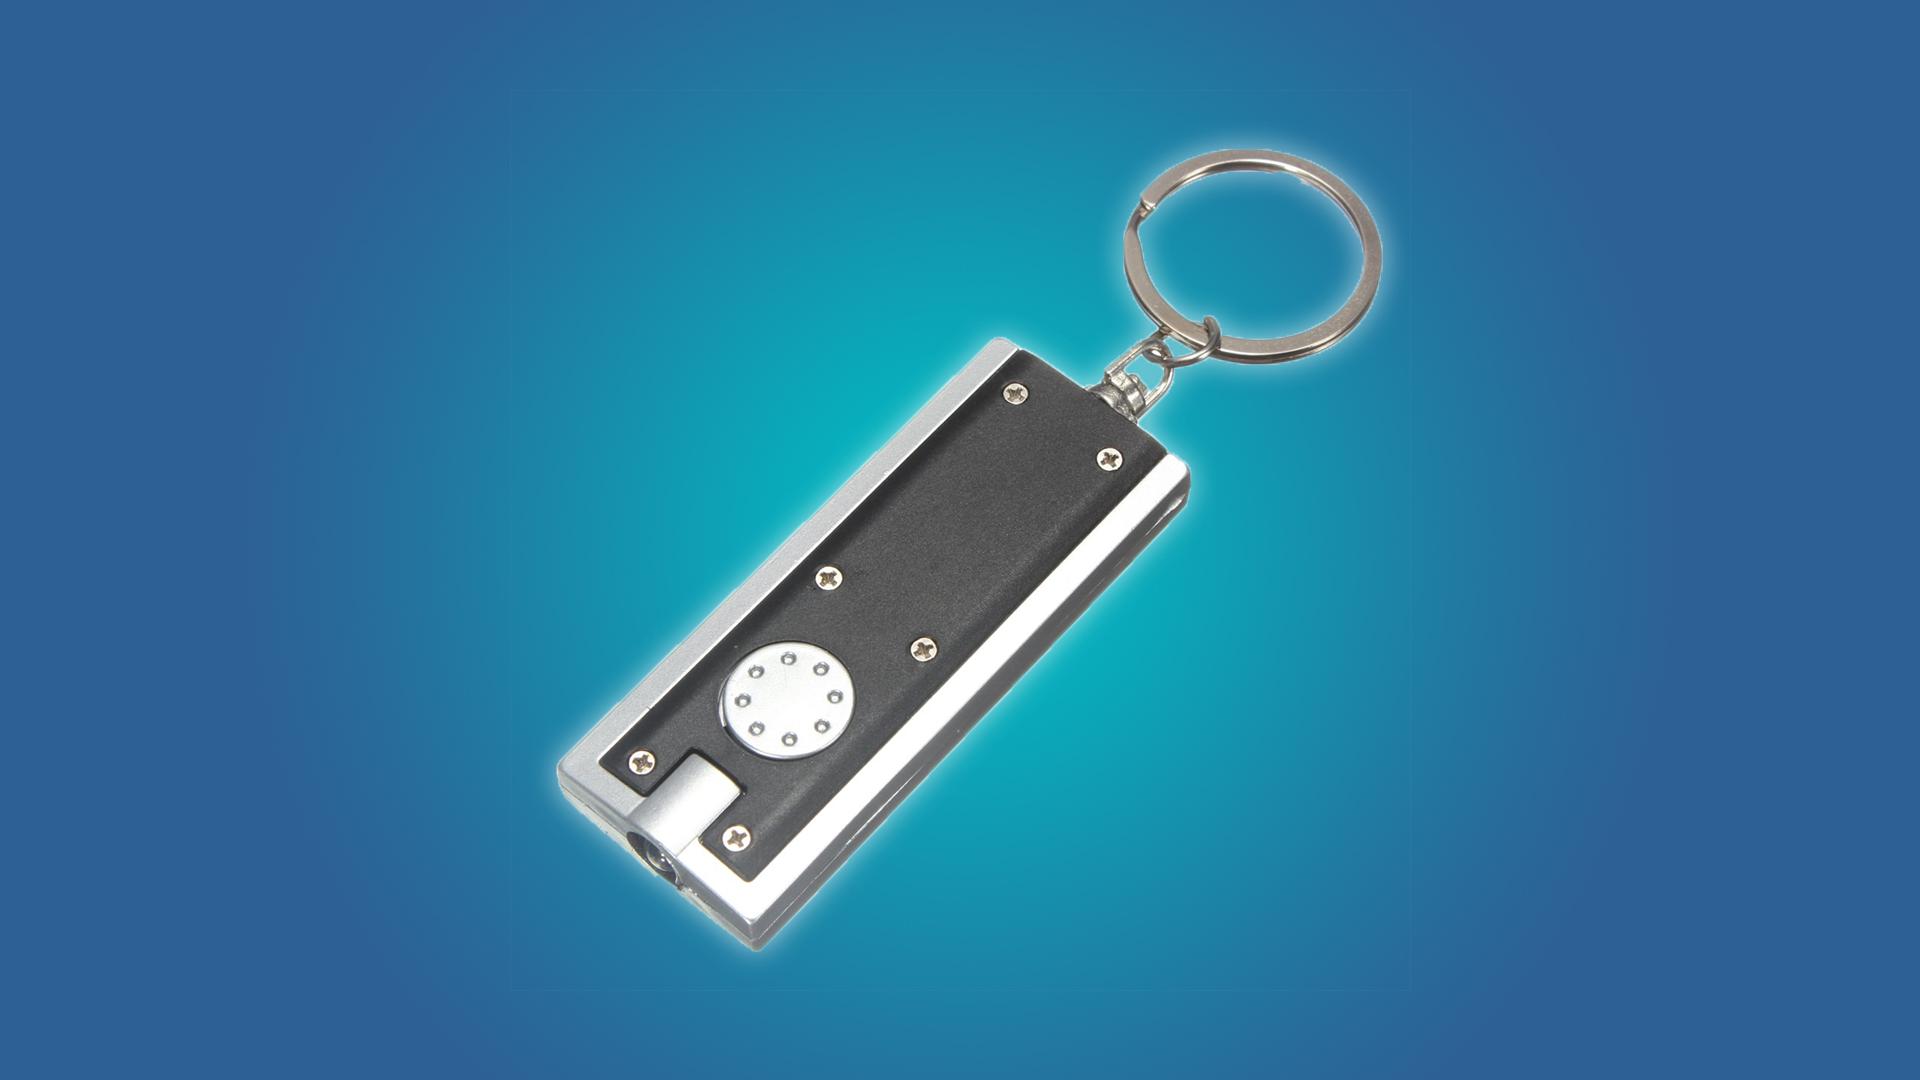 The Mecco keychain flashlight